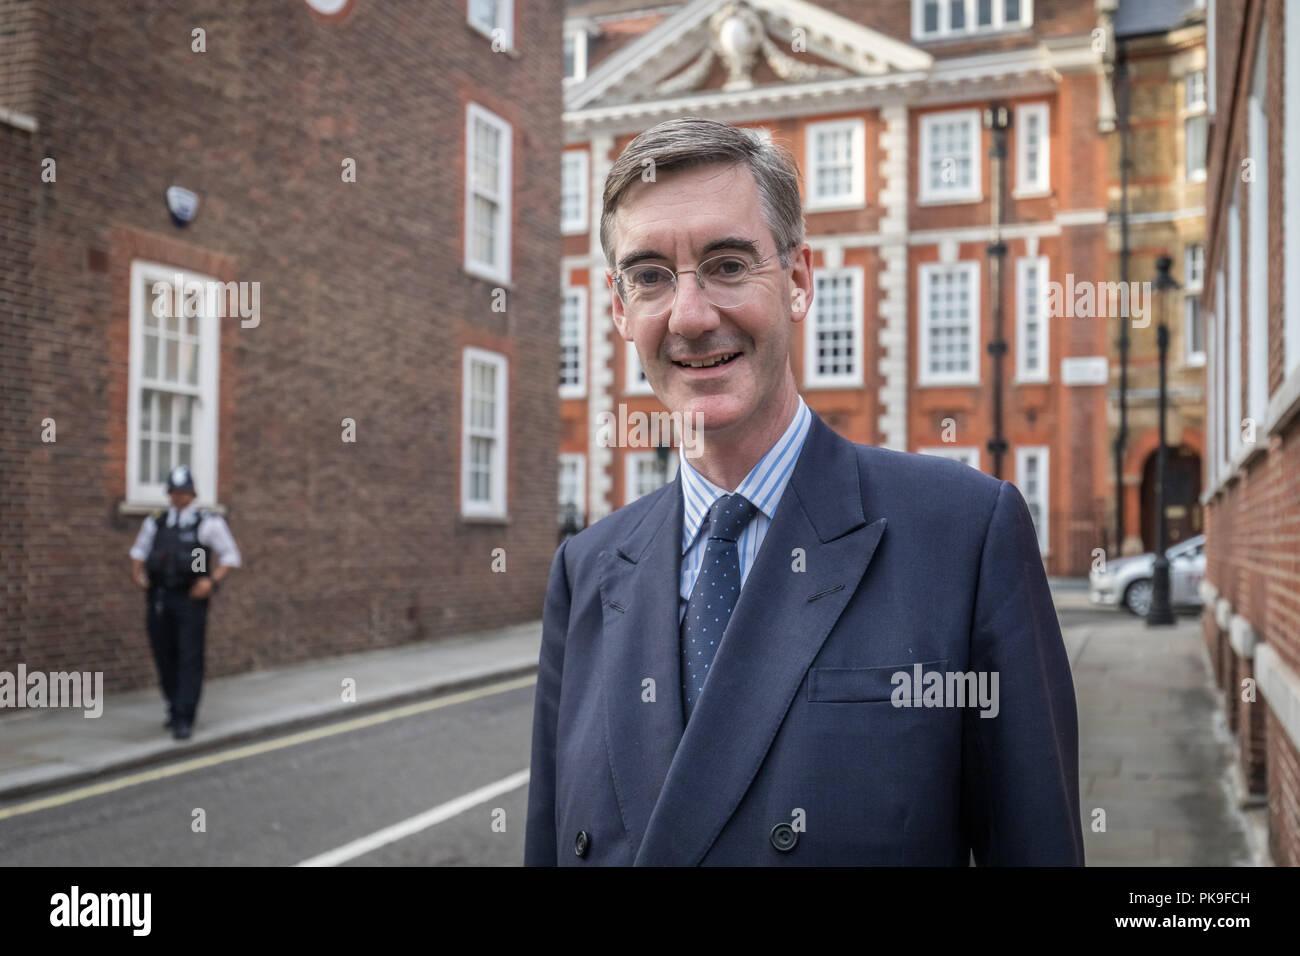 Jacob Rees-Mogg, Converative MP - Stock Image